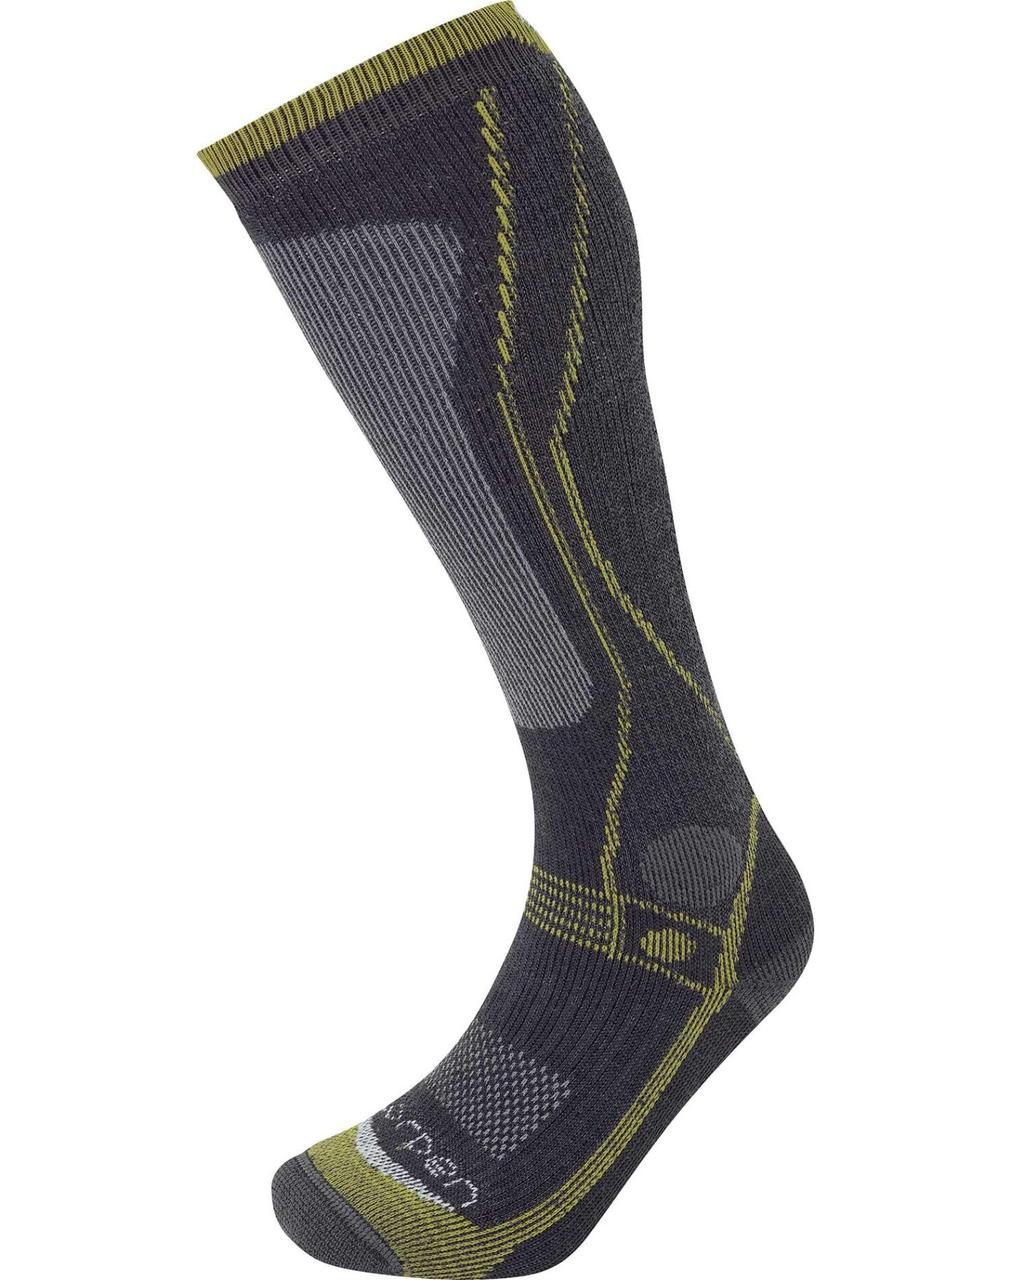 Шкарпетки Lorpen T3 Heavy Trekker Overcalf T3HTO Charcoal XL (6210092 5427 XL)